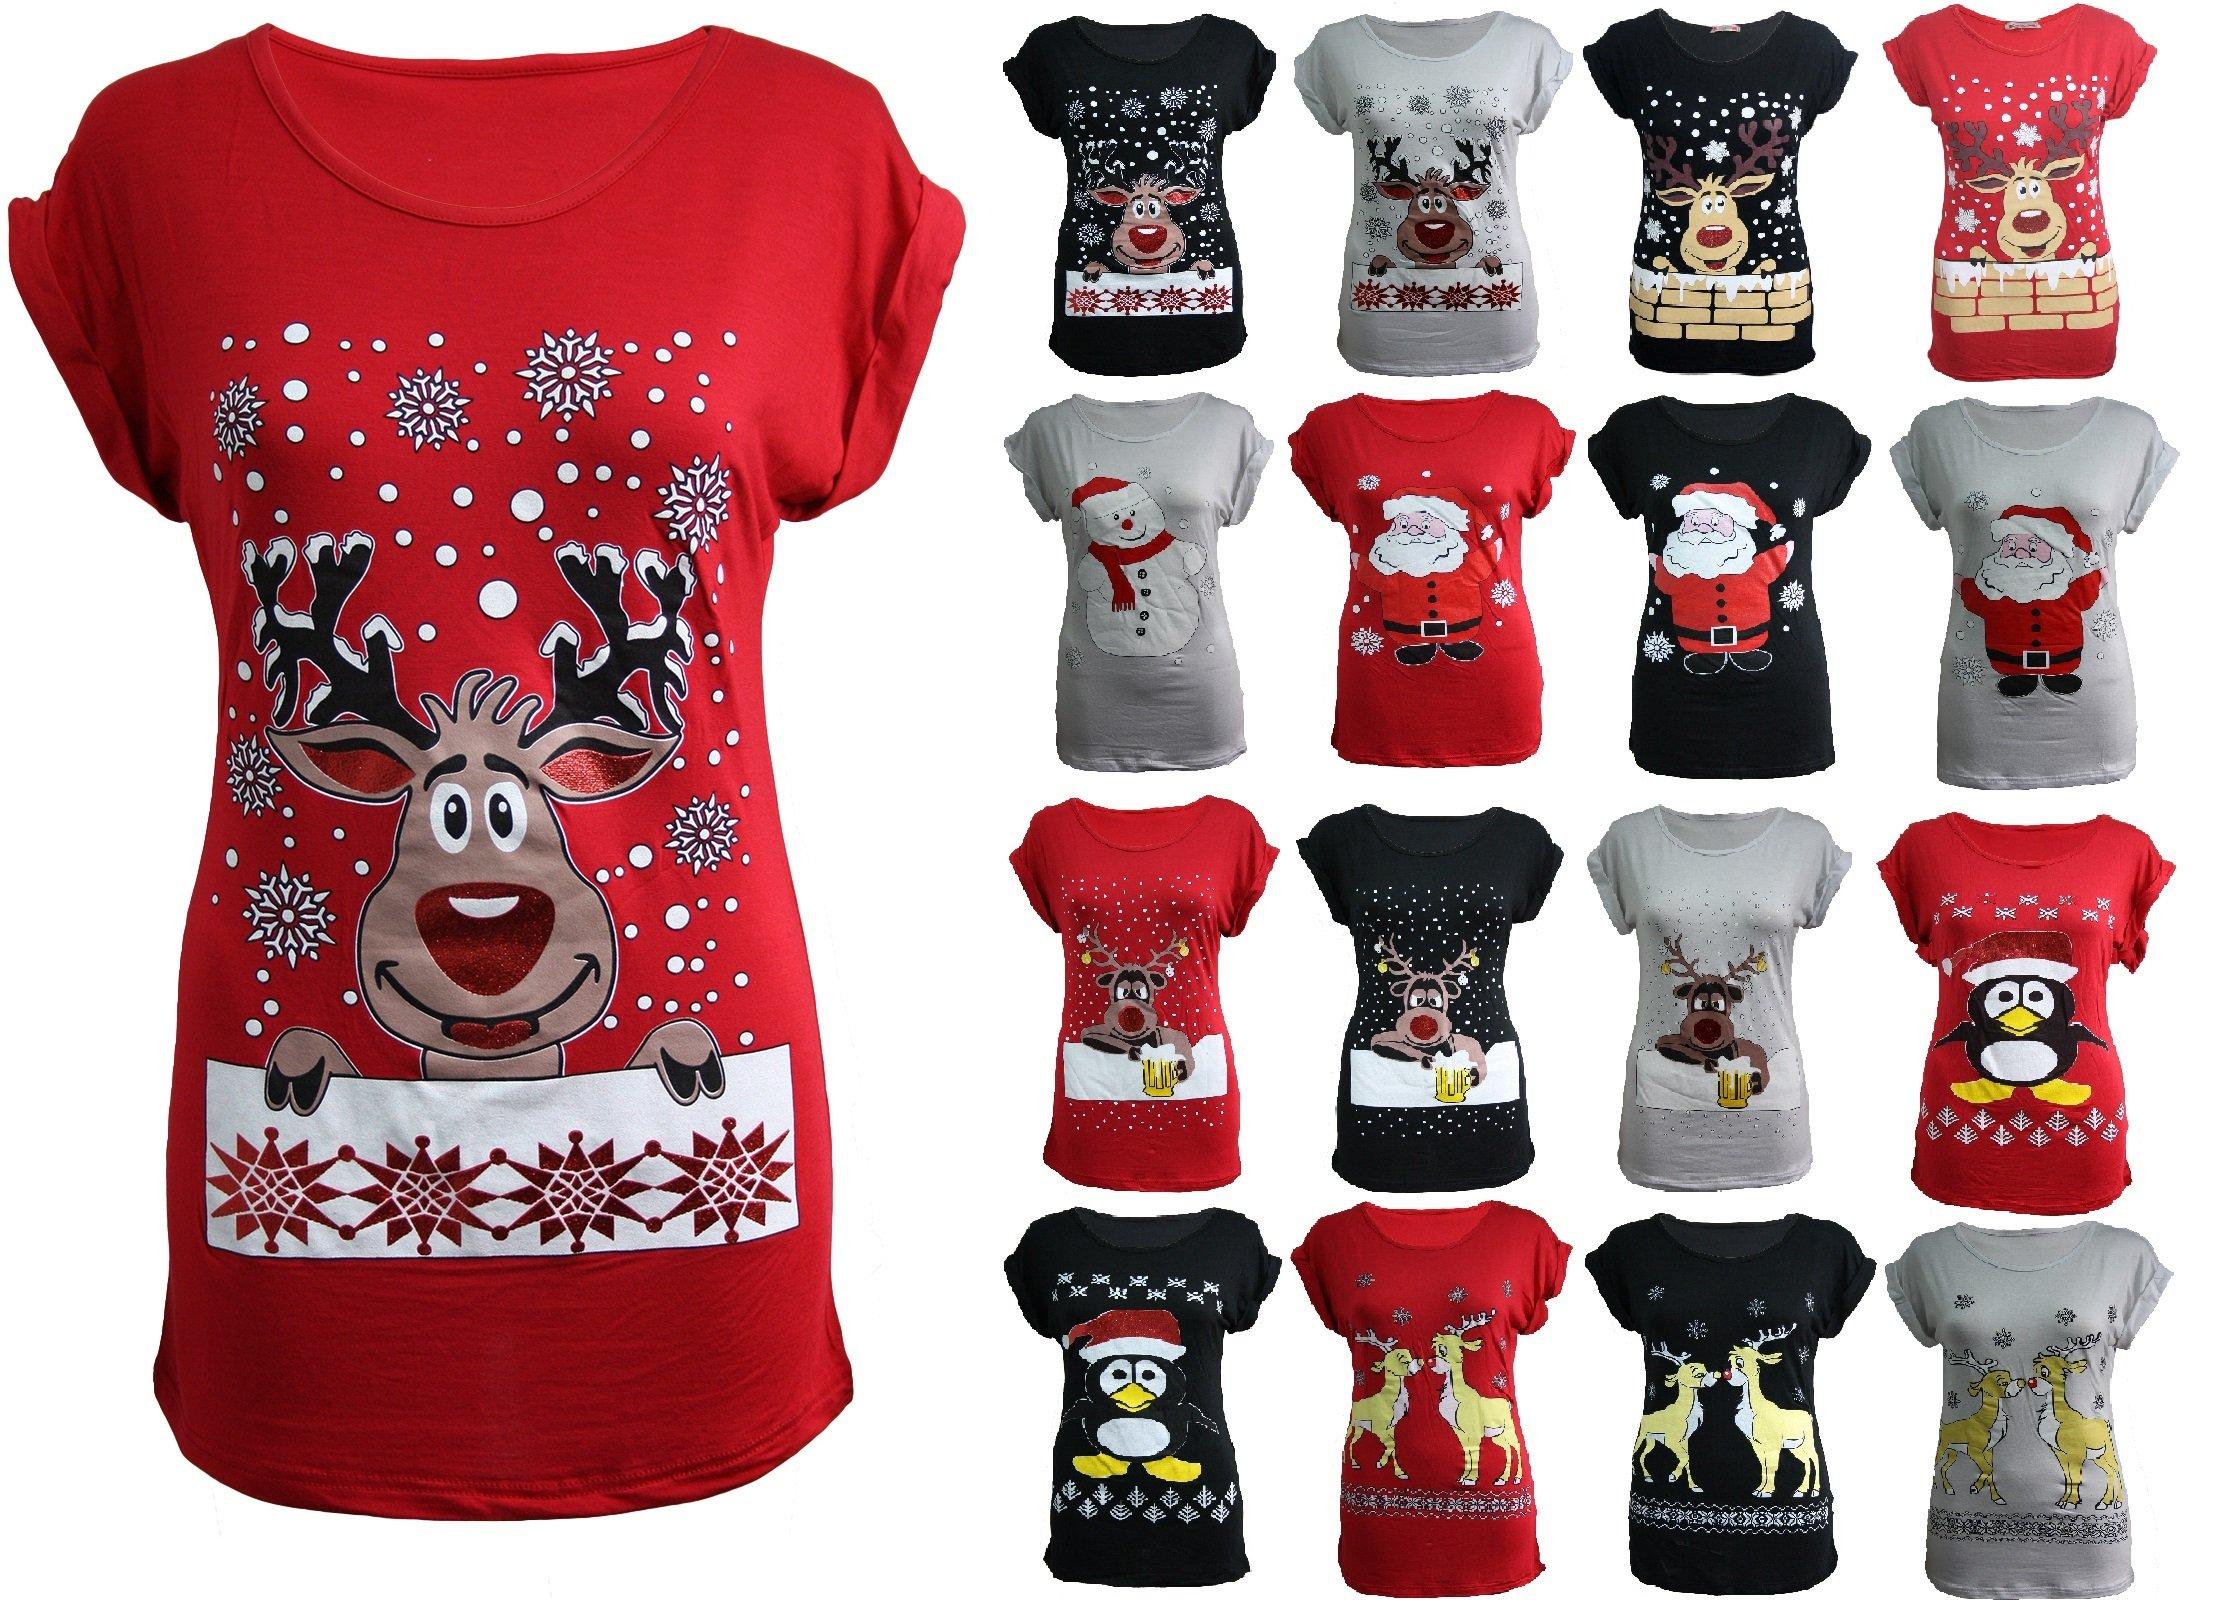 Christmas Tops.Womens Ladies Christmas Glitter T Shirt Reindeer Santa Snowman Print Xmas Tops Novelty Christmas Jumpers